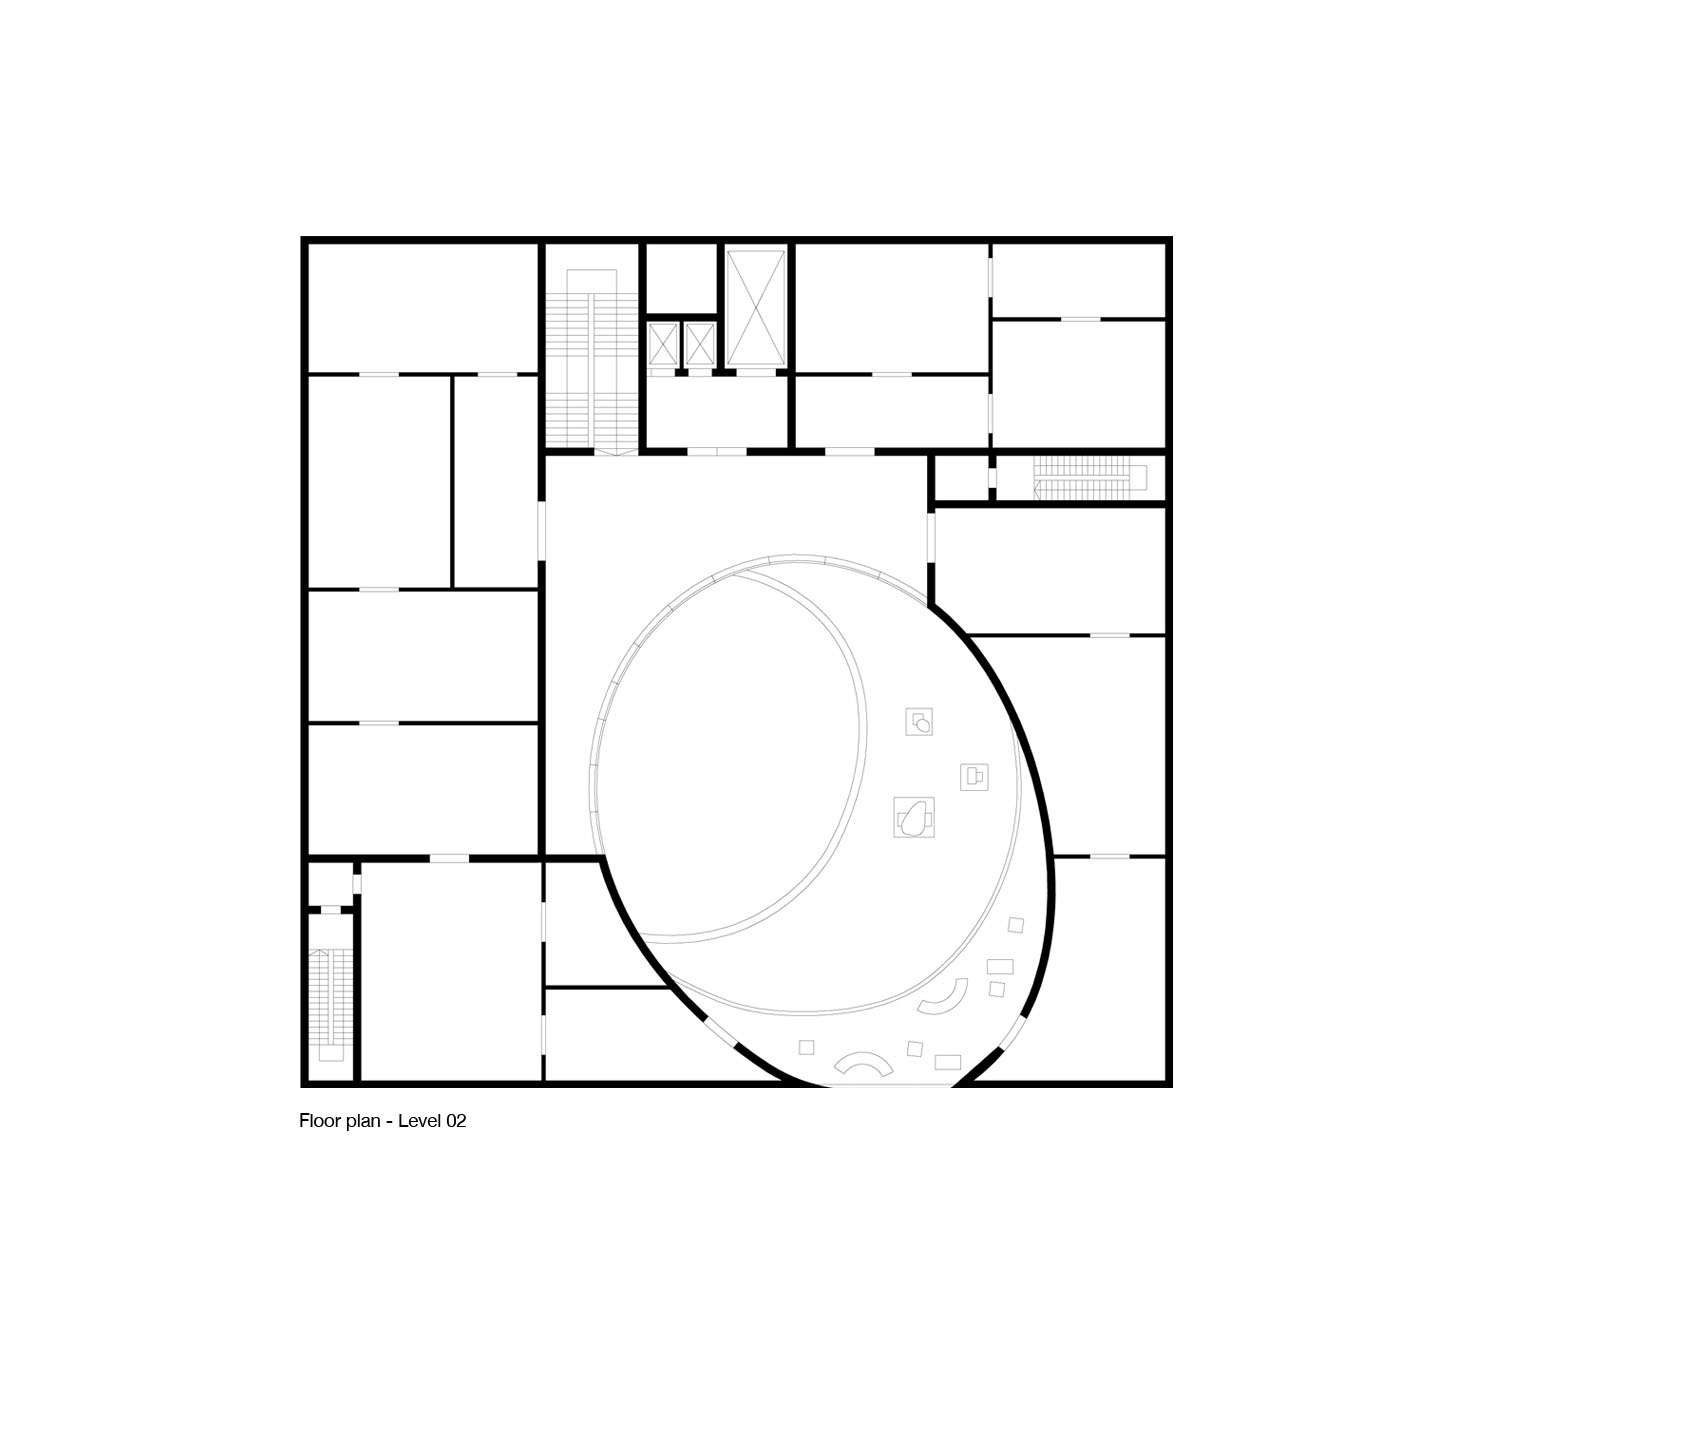 New Bauhaus Museum-Image 09.jpg